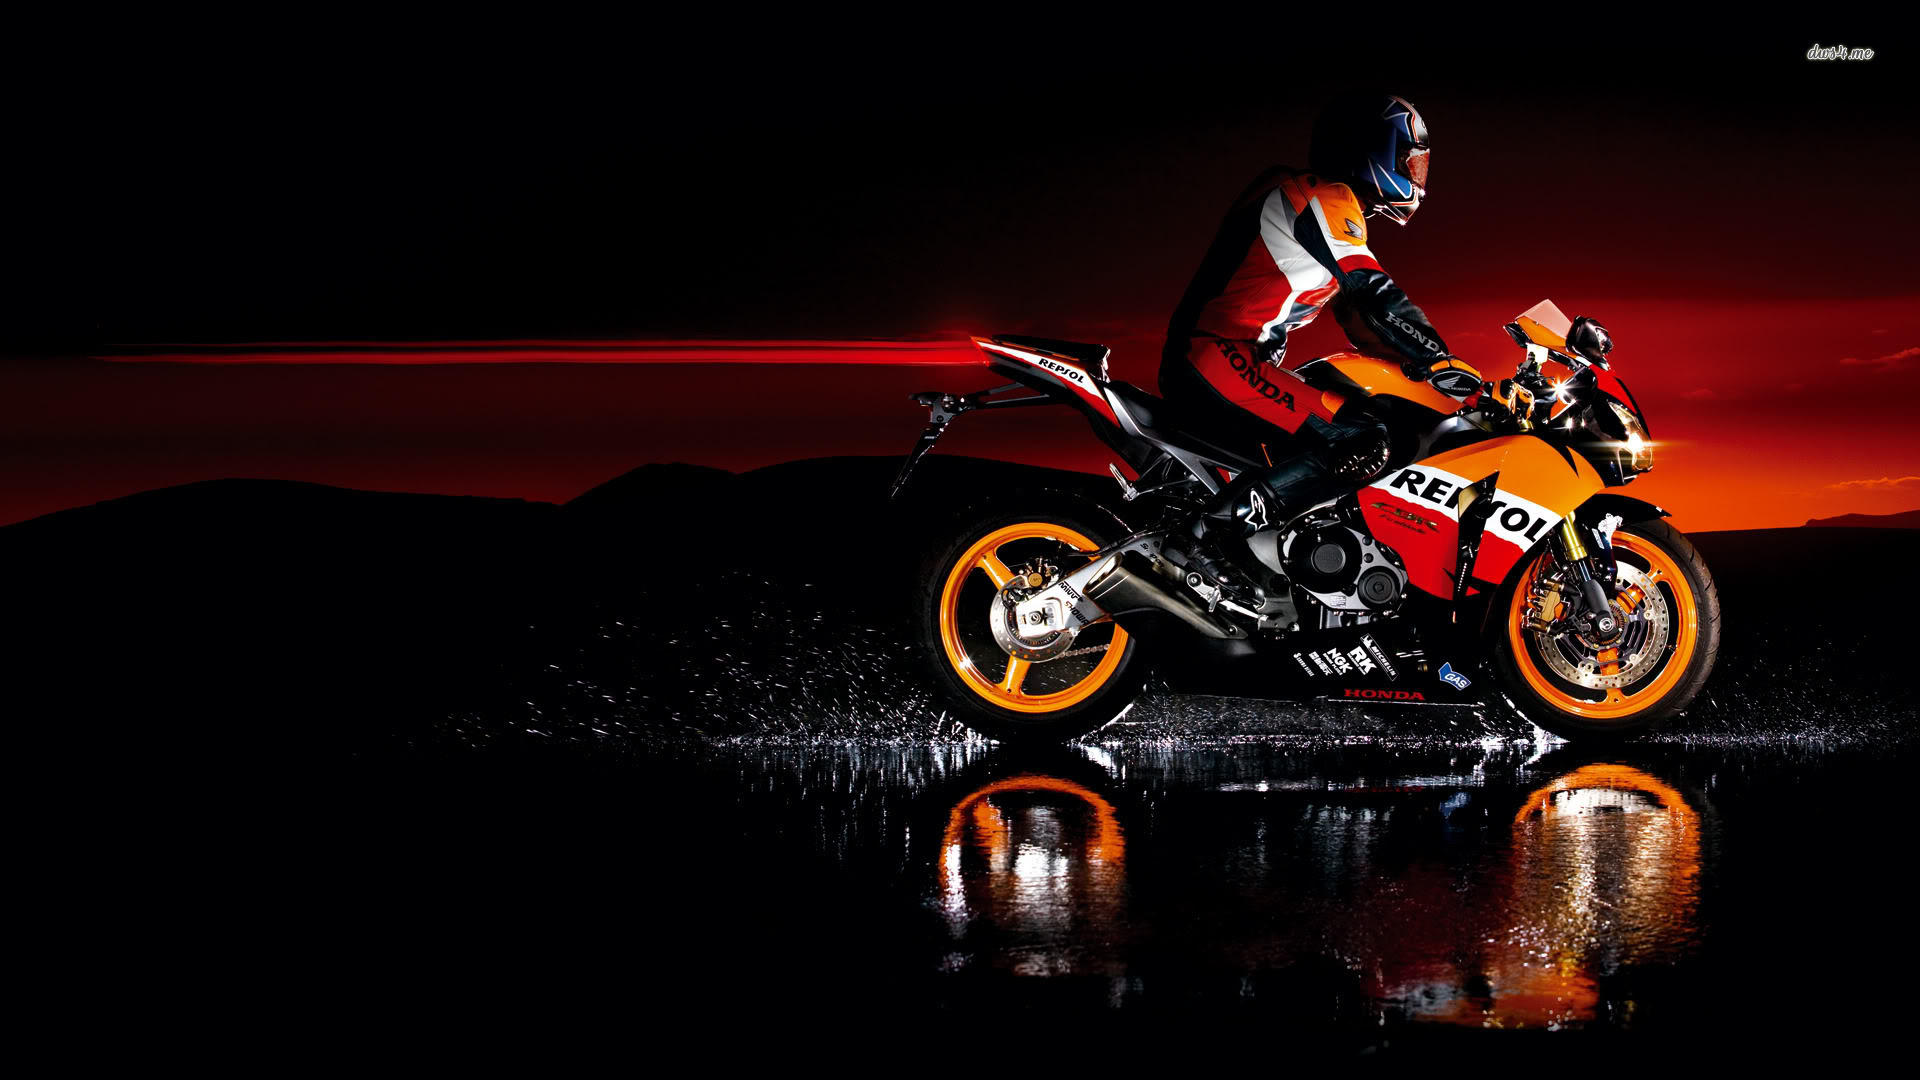 Honda Repsol wallpaper   Motorcycle wallpapers   1472 1920x1080